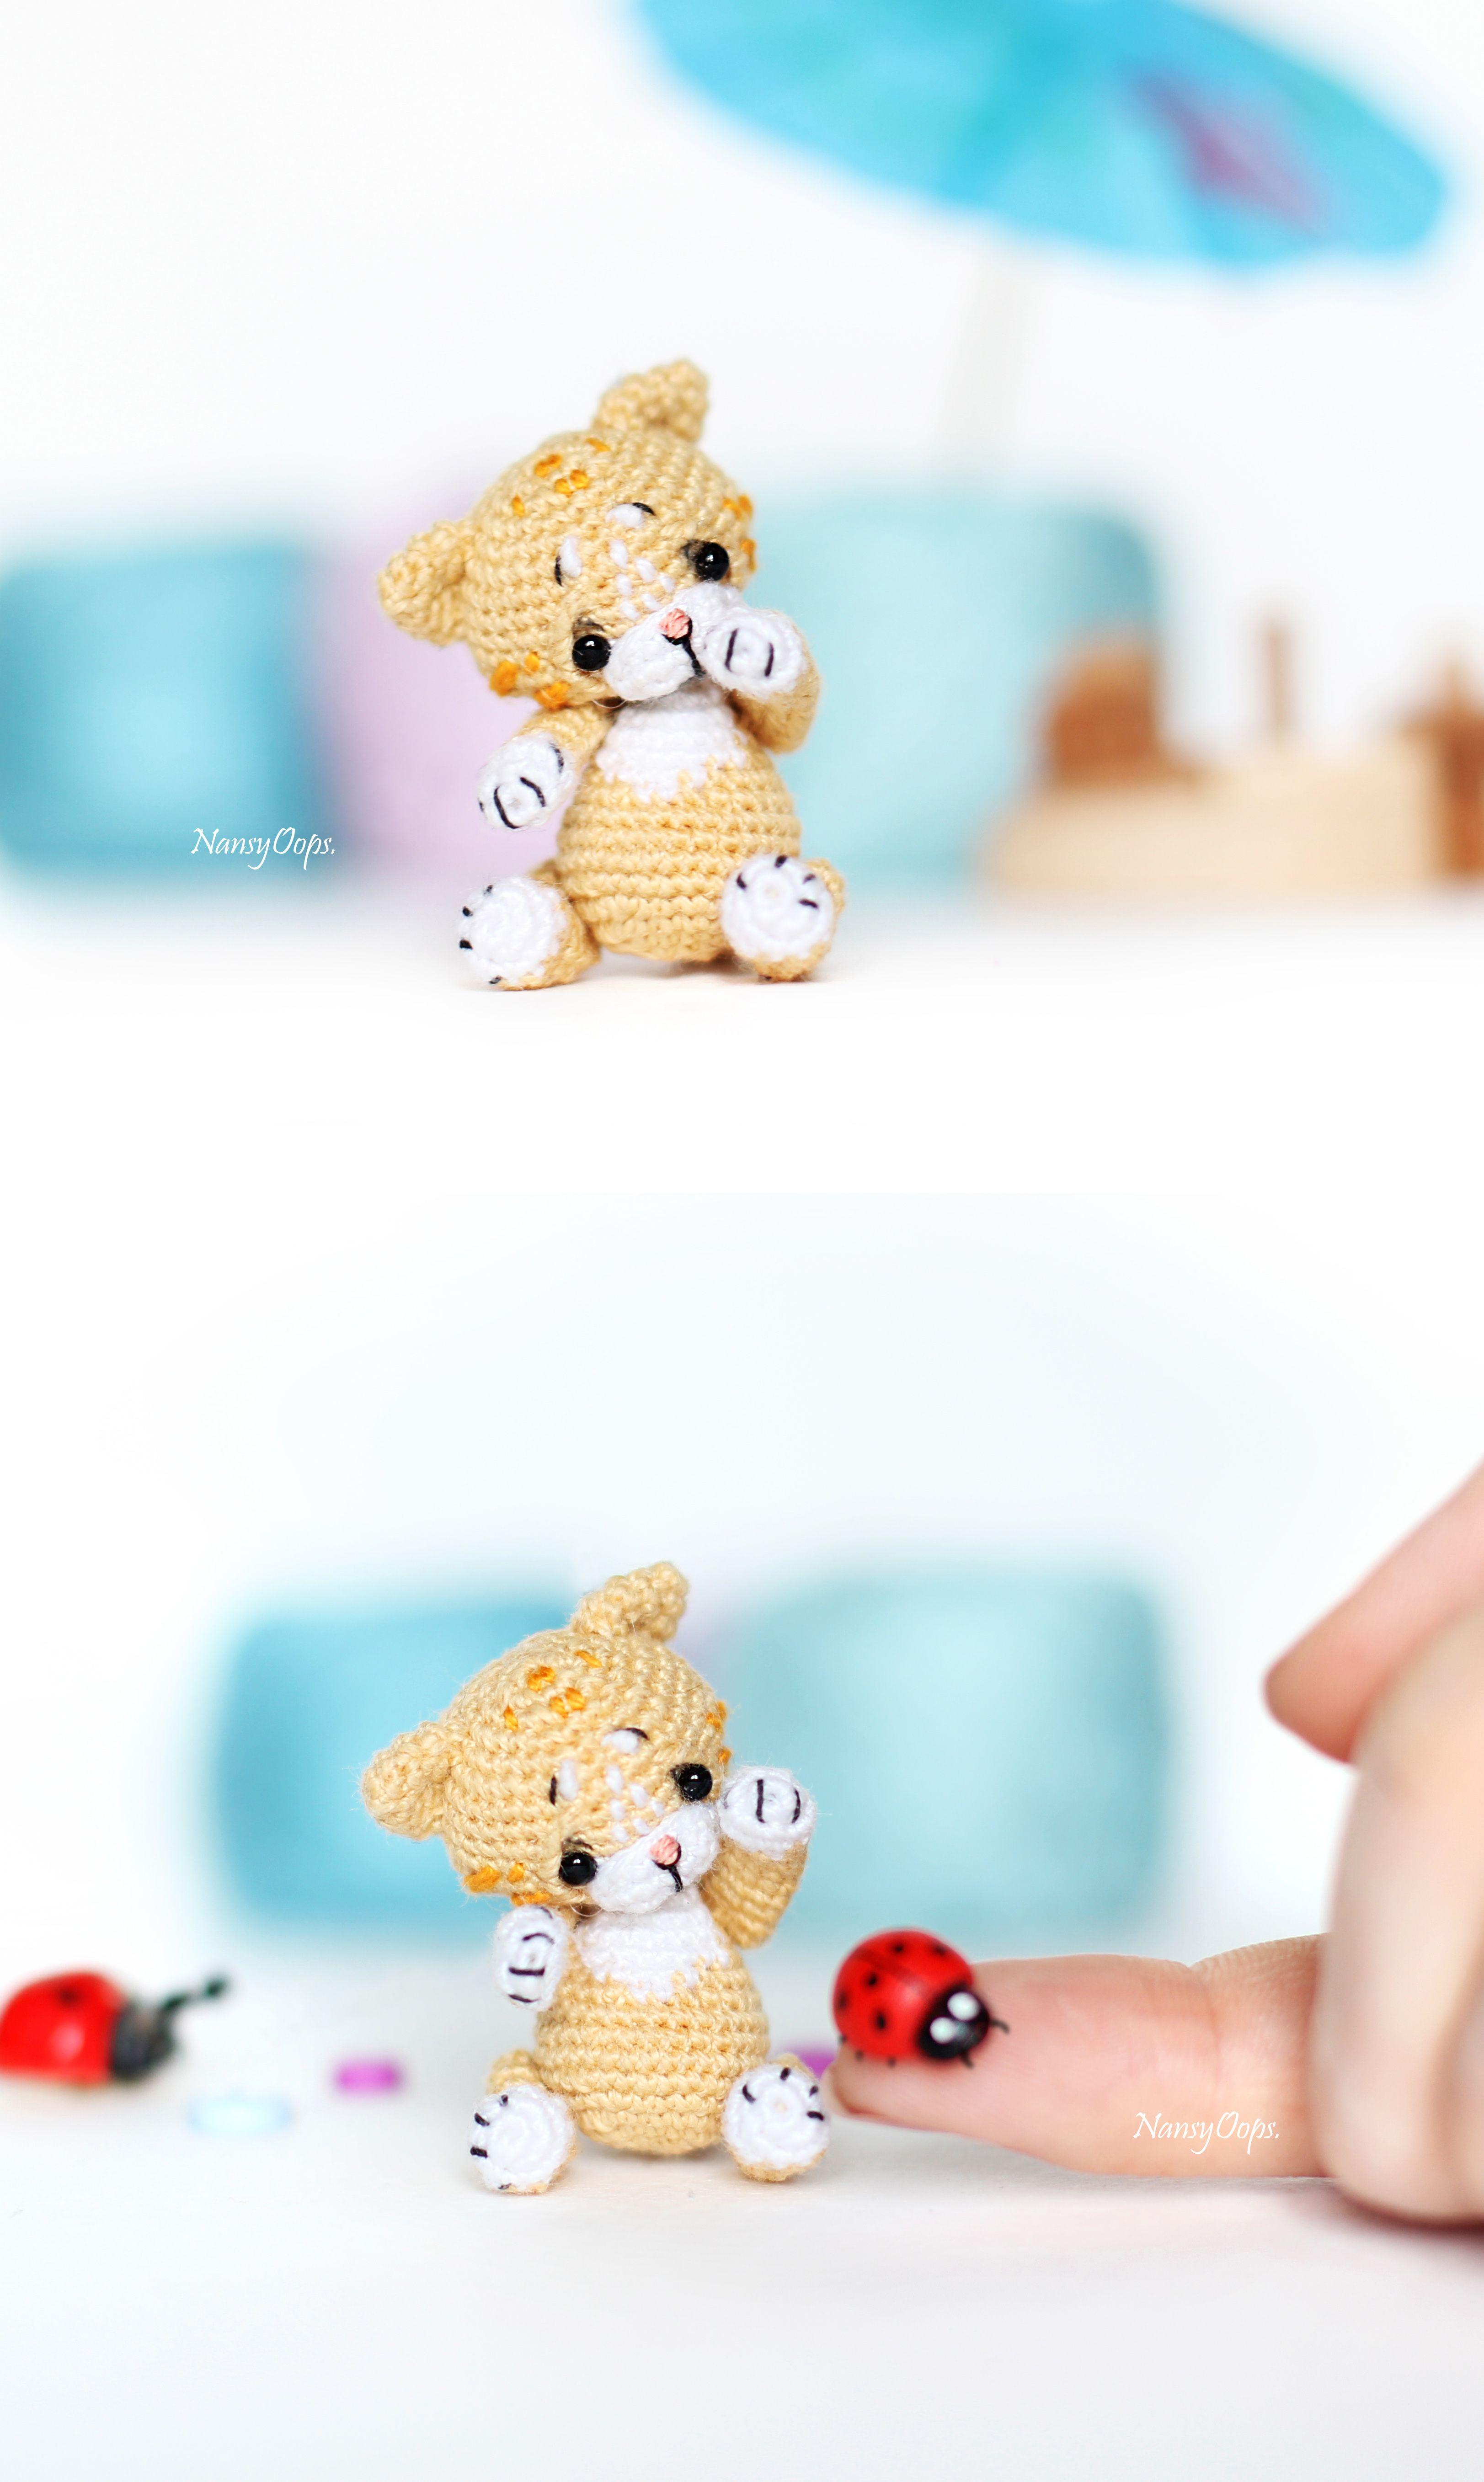 Tiny cat amigurumi pattern | Amiguroom Toys | 5429x3246